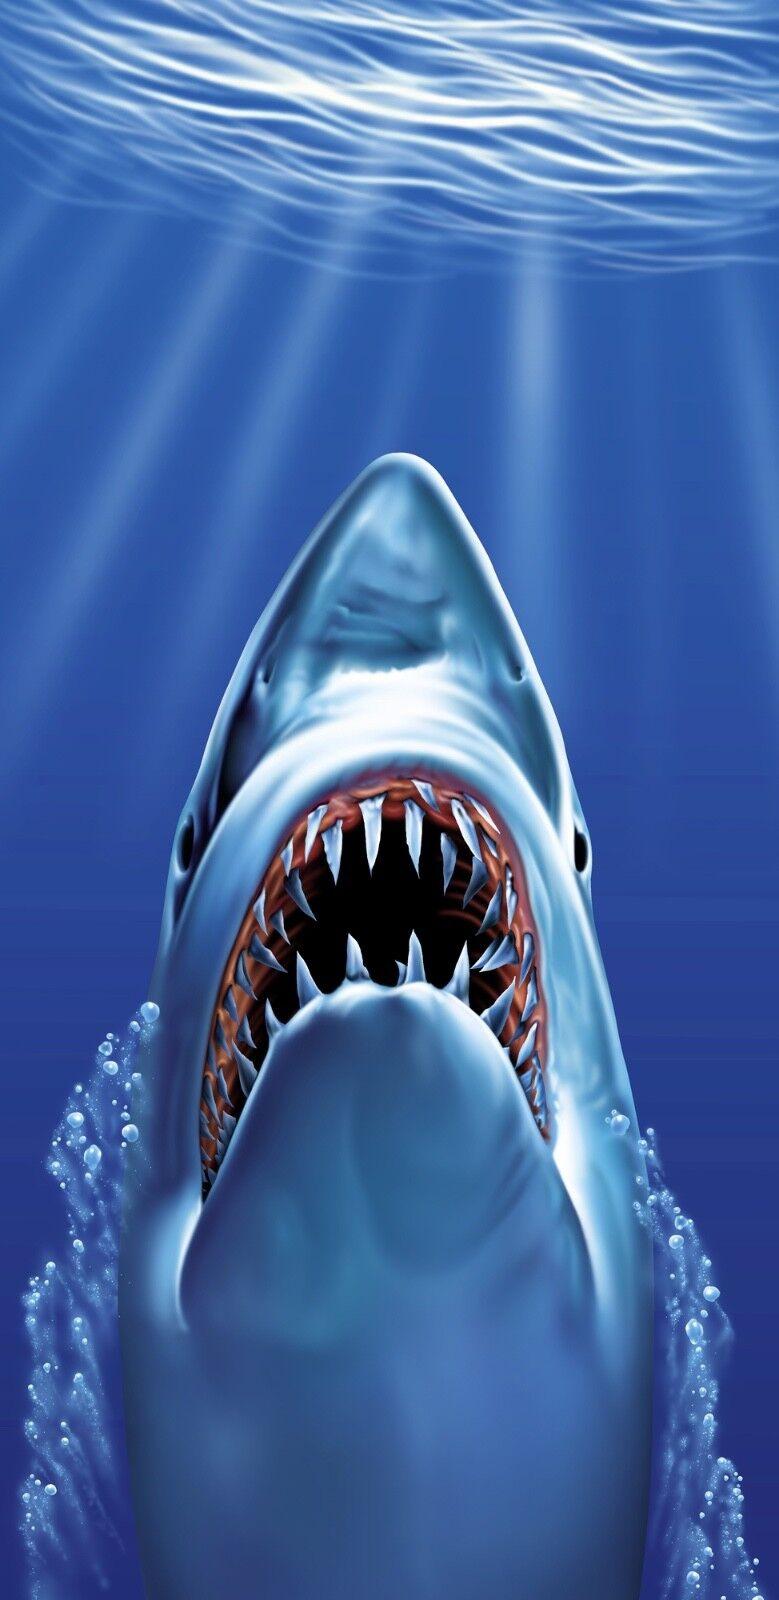 30x60 Large Great Weiß Shark Fish Fish Fish Cruise Vacation Pool Gift Bath Beach Towel b68e21